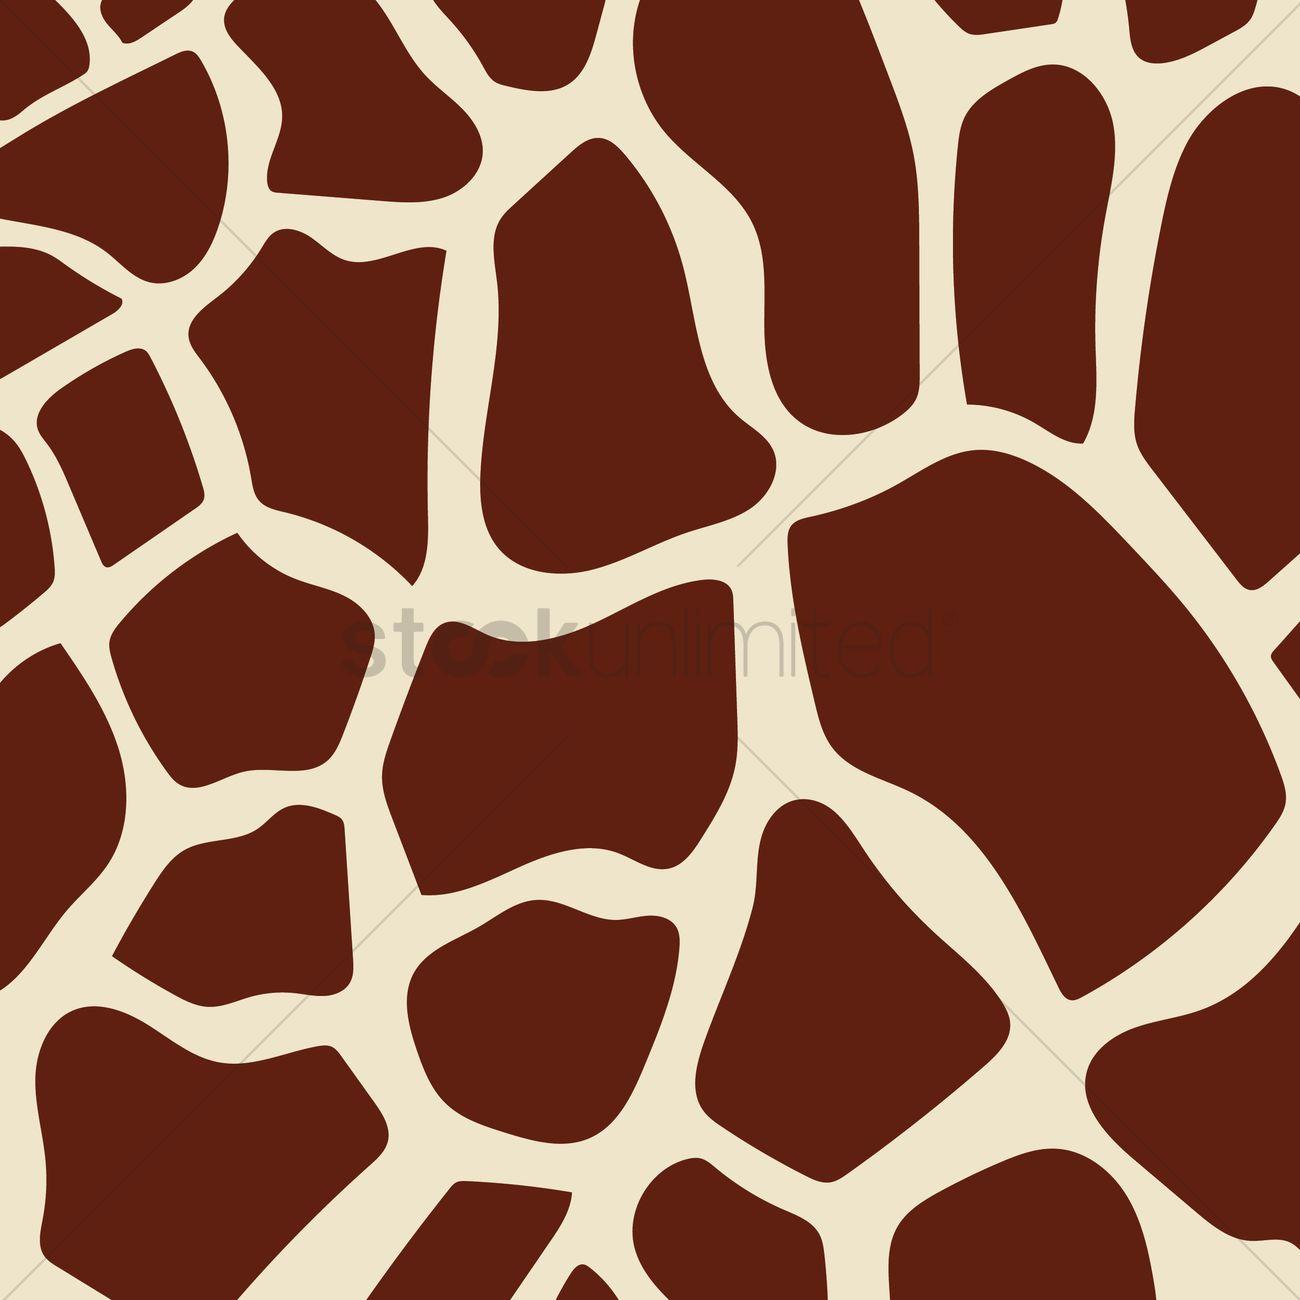 Giraffe Print Background Vector Image